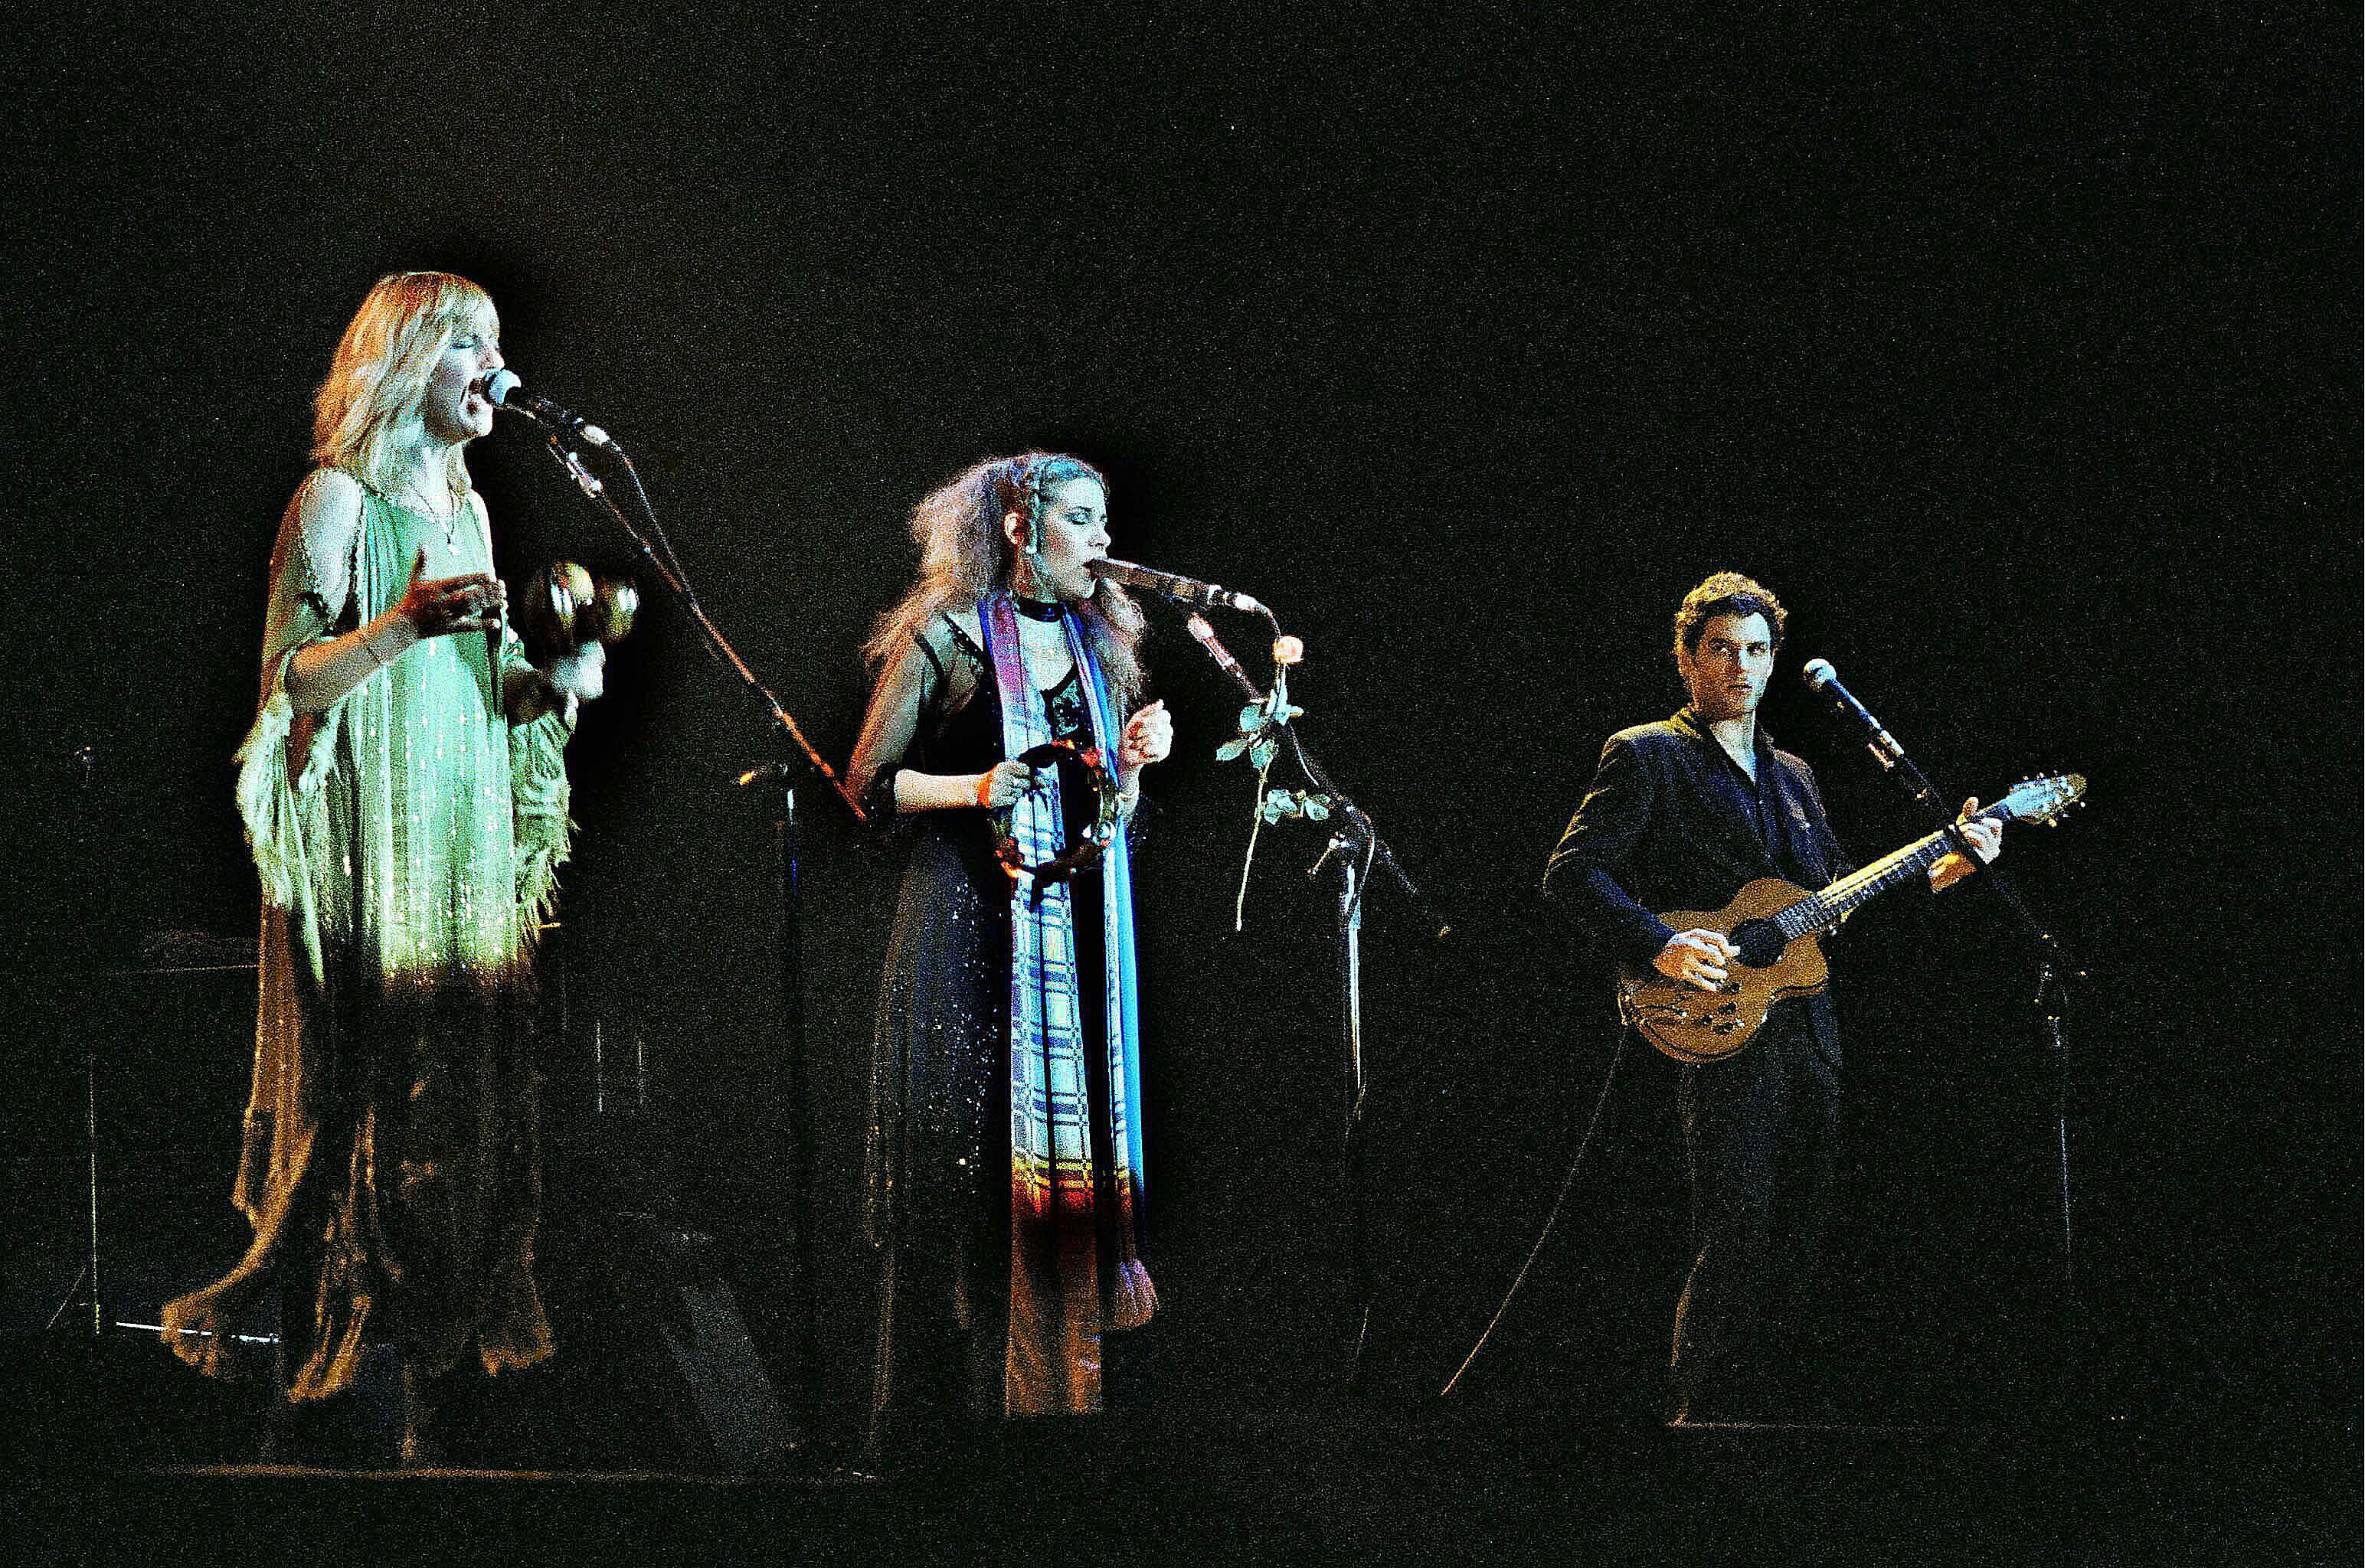 Top Fleetwood Mac Songs of the '80s